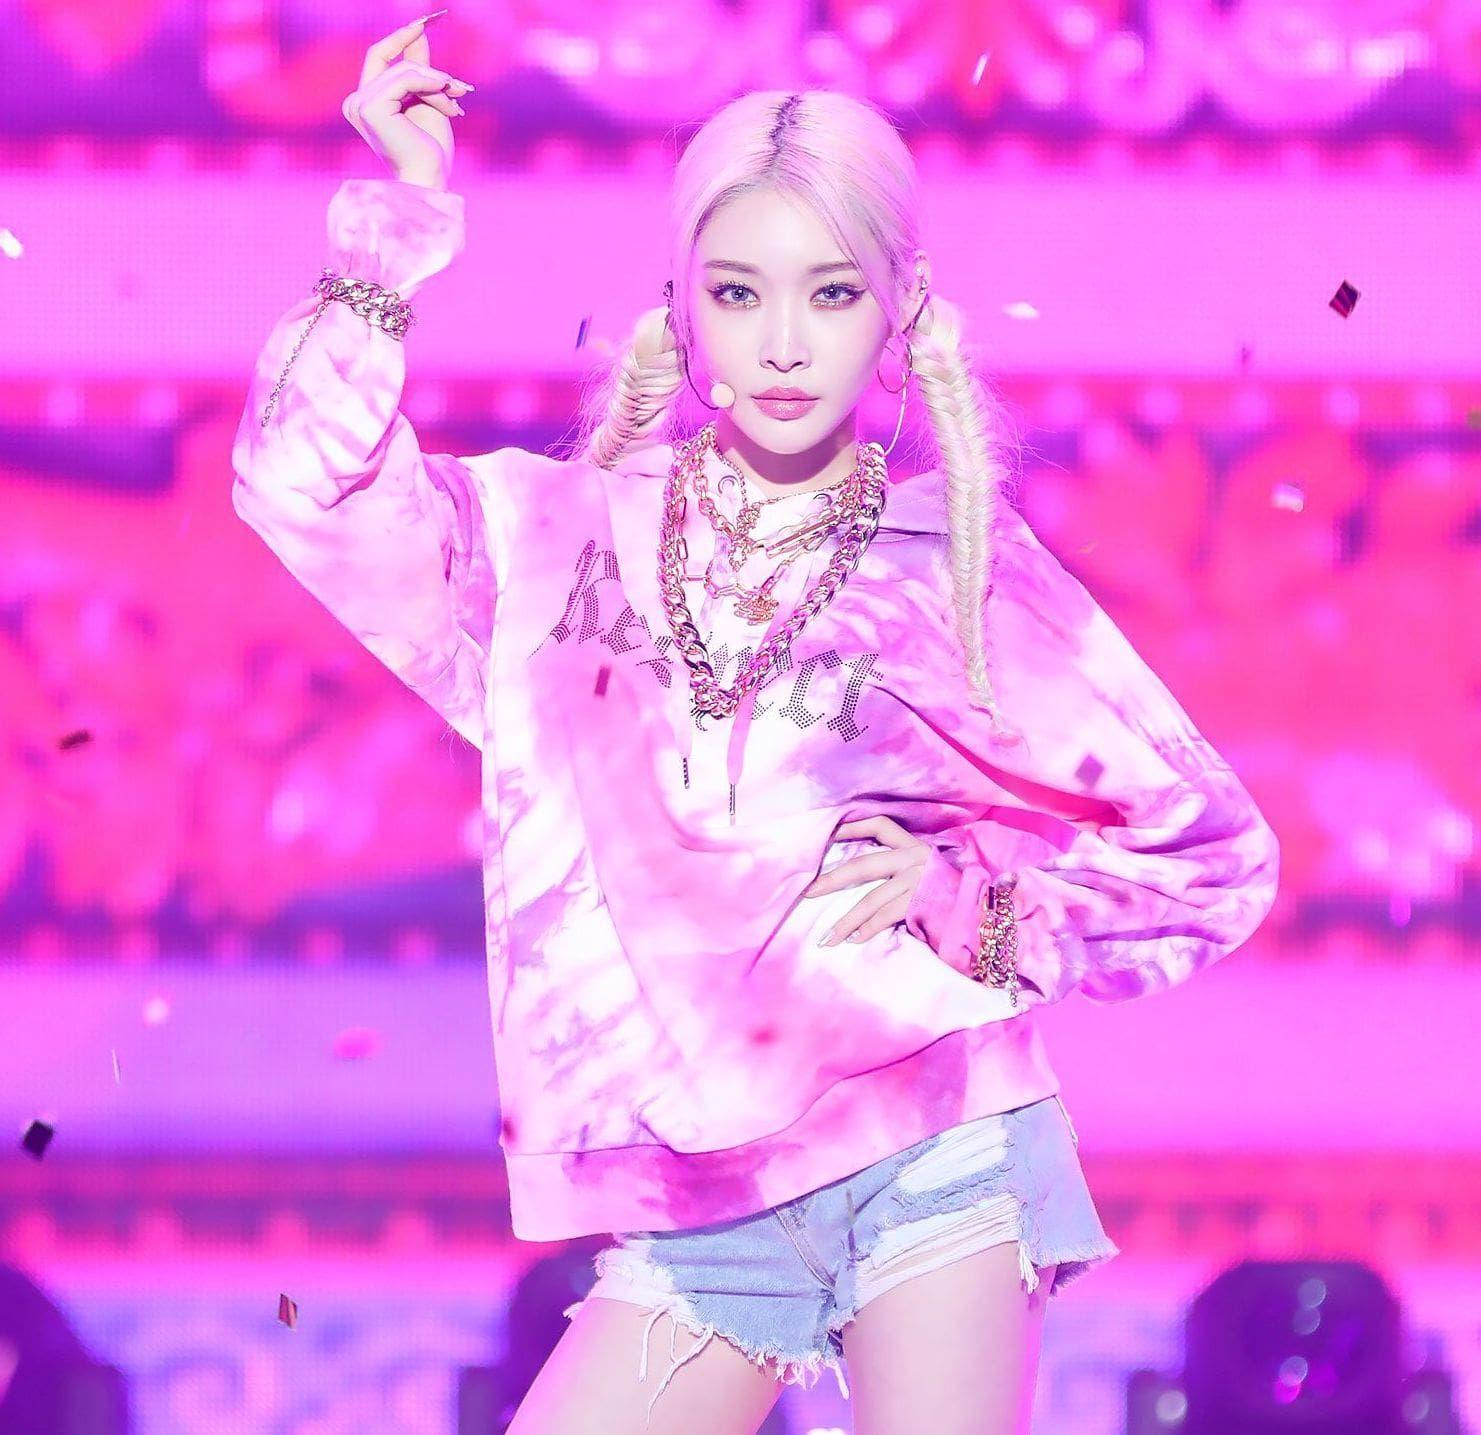 Respect Tie Dye Oversized Hoodie Chungha K Fashion At Fashionchingu Fashion Kpop Fashion Kpop Outfits